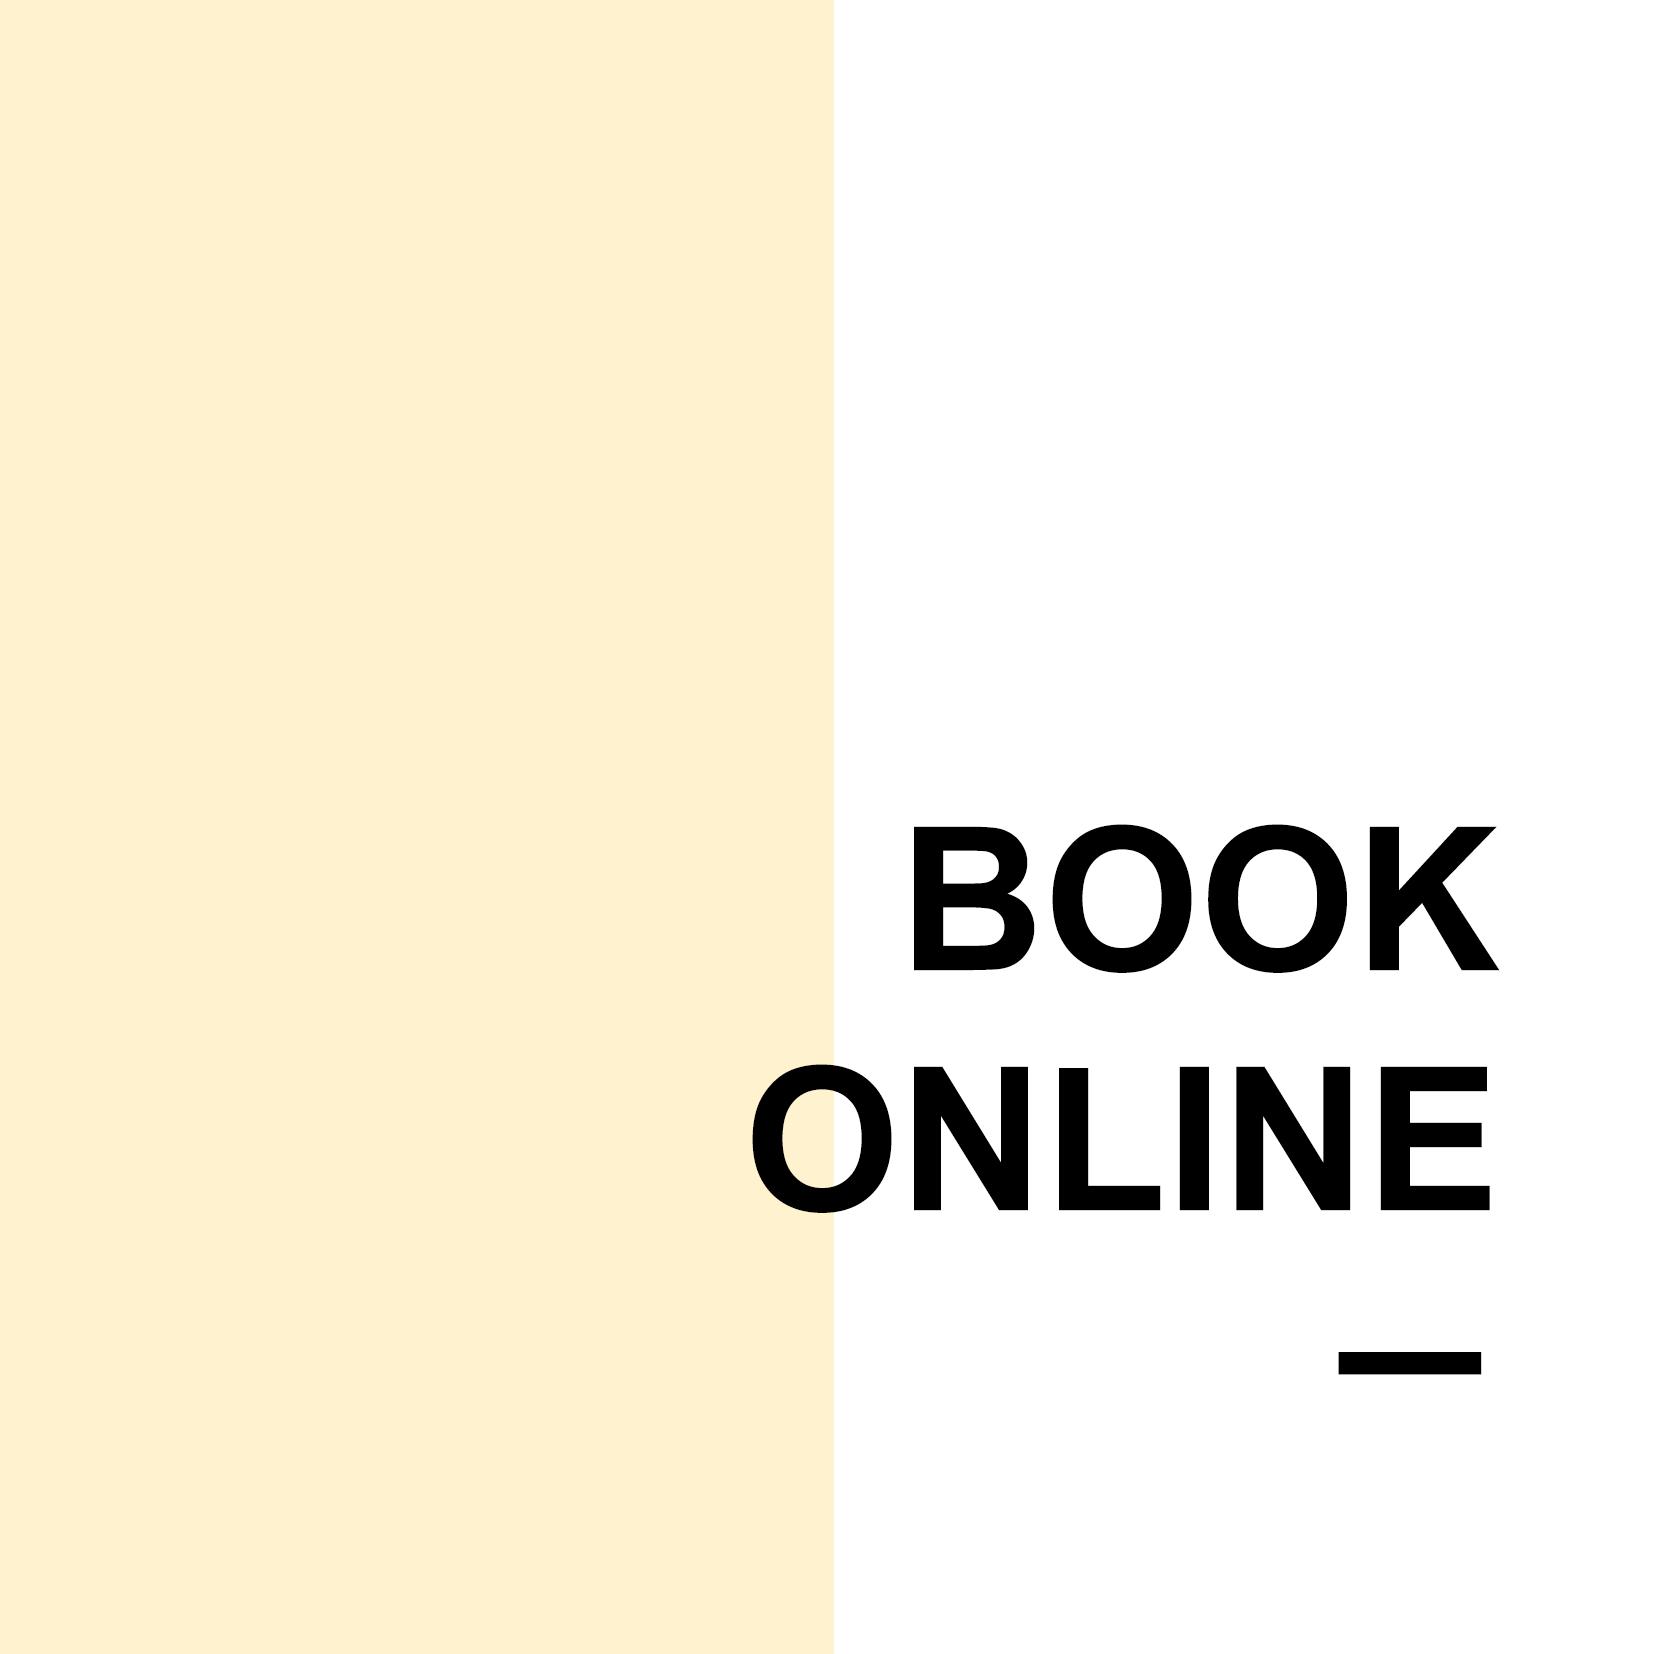 THUMB_book2.png